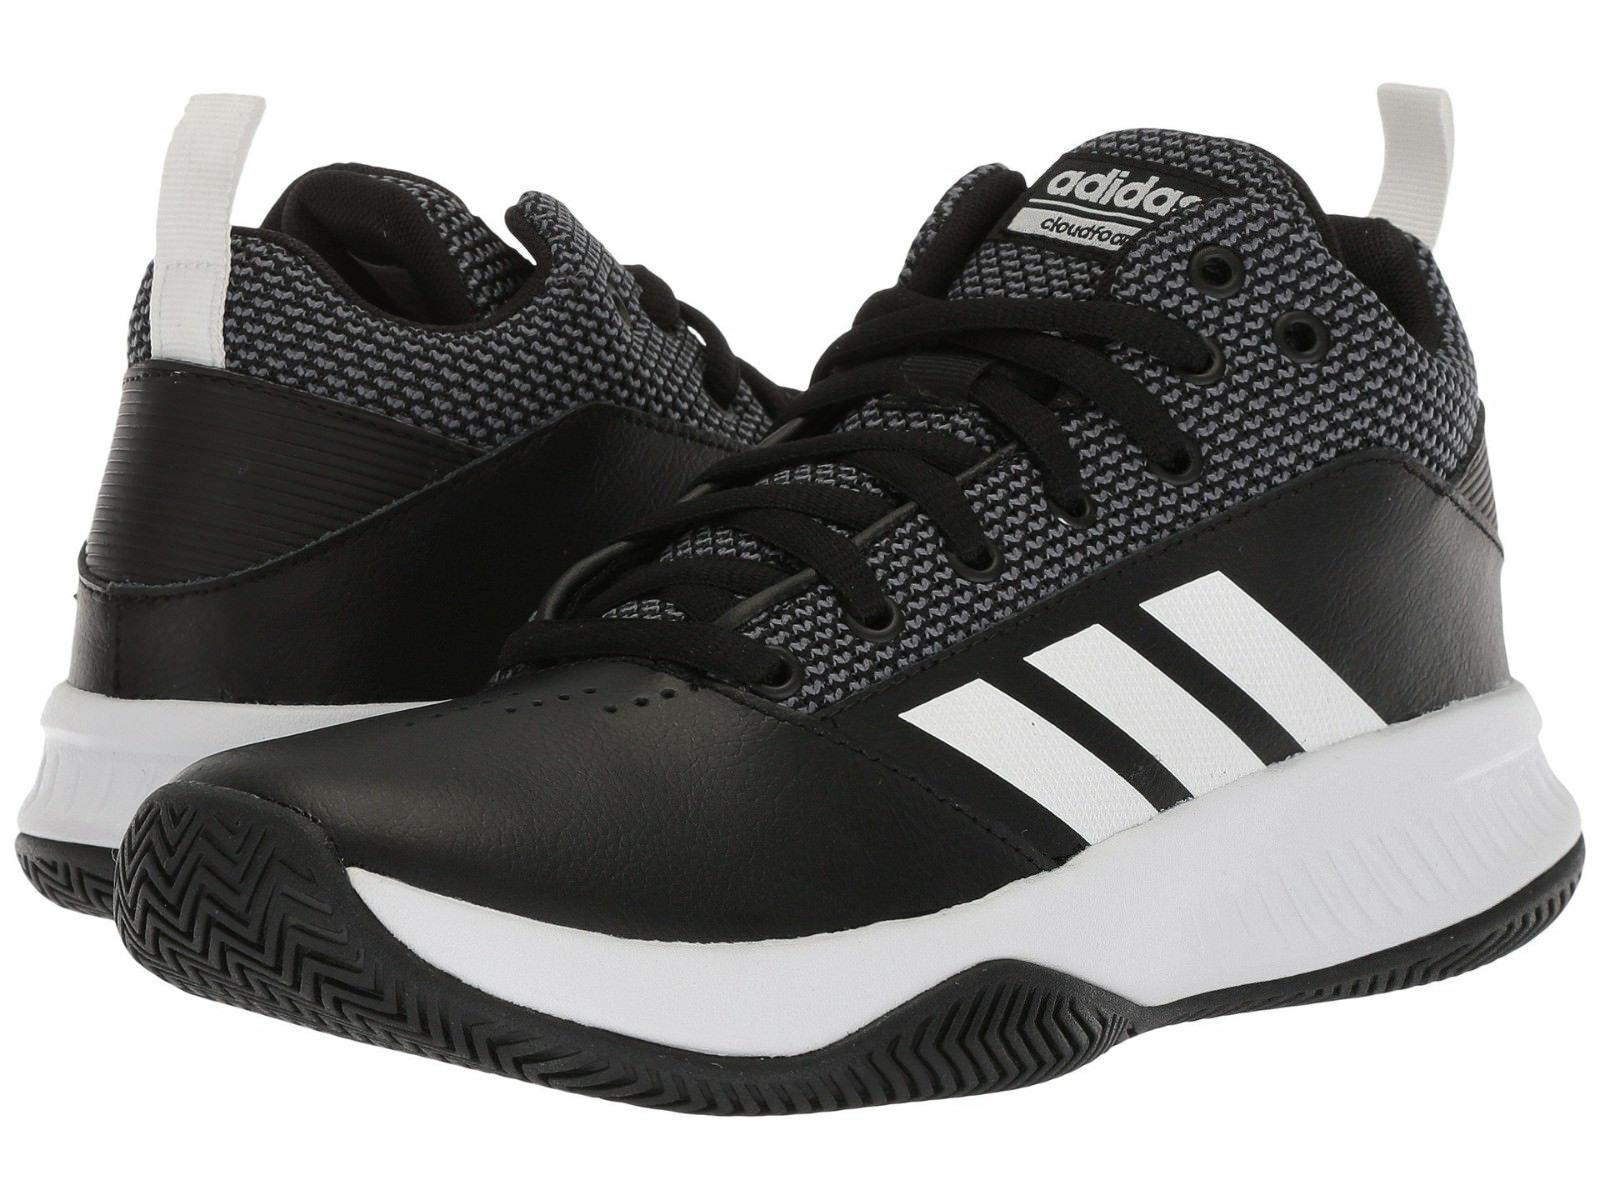 Men Adidas ILation 2.0 Basketball shoes DA9847 Black White Grey 100% Authentic